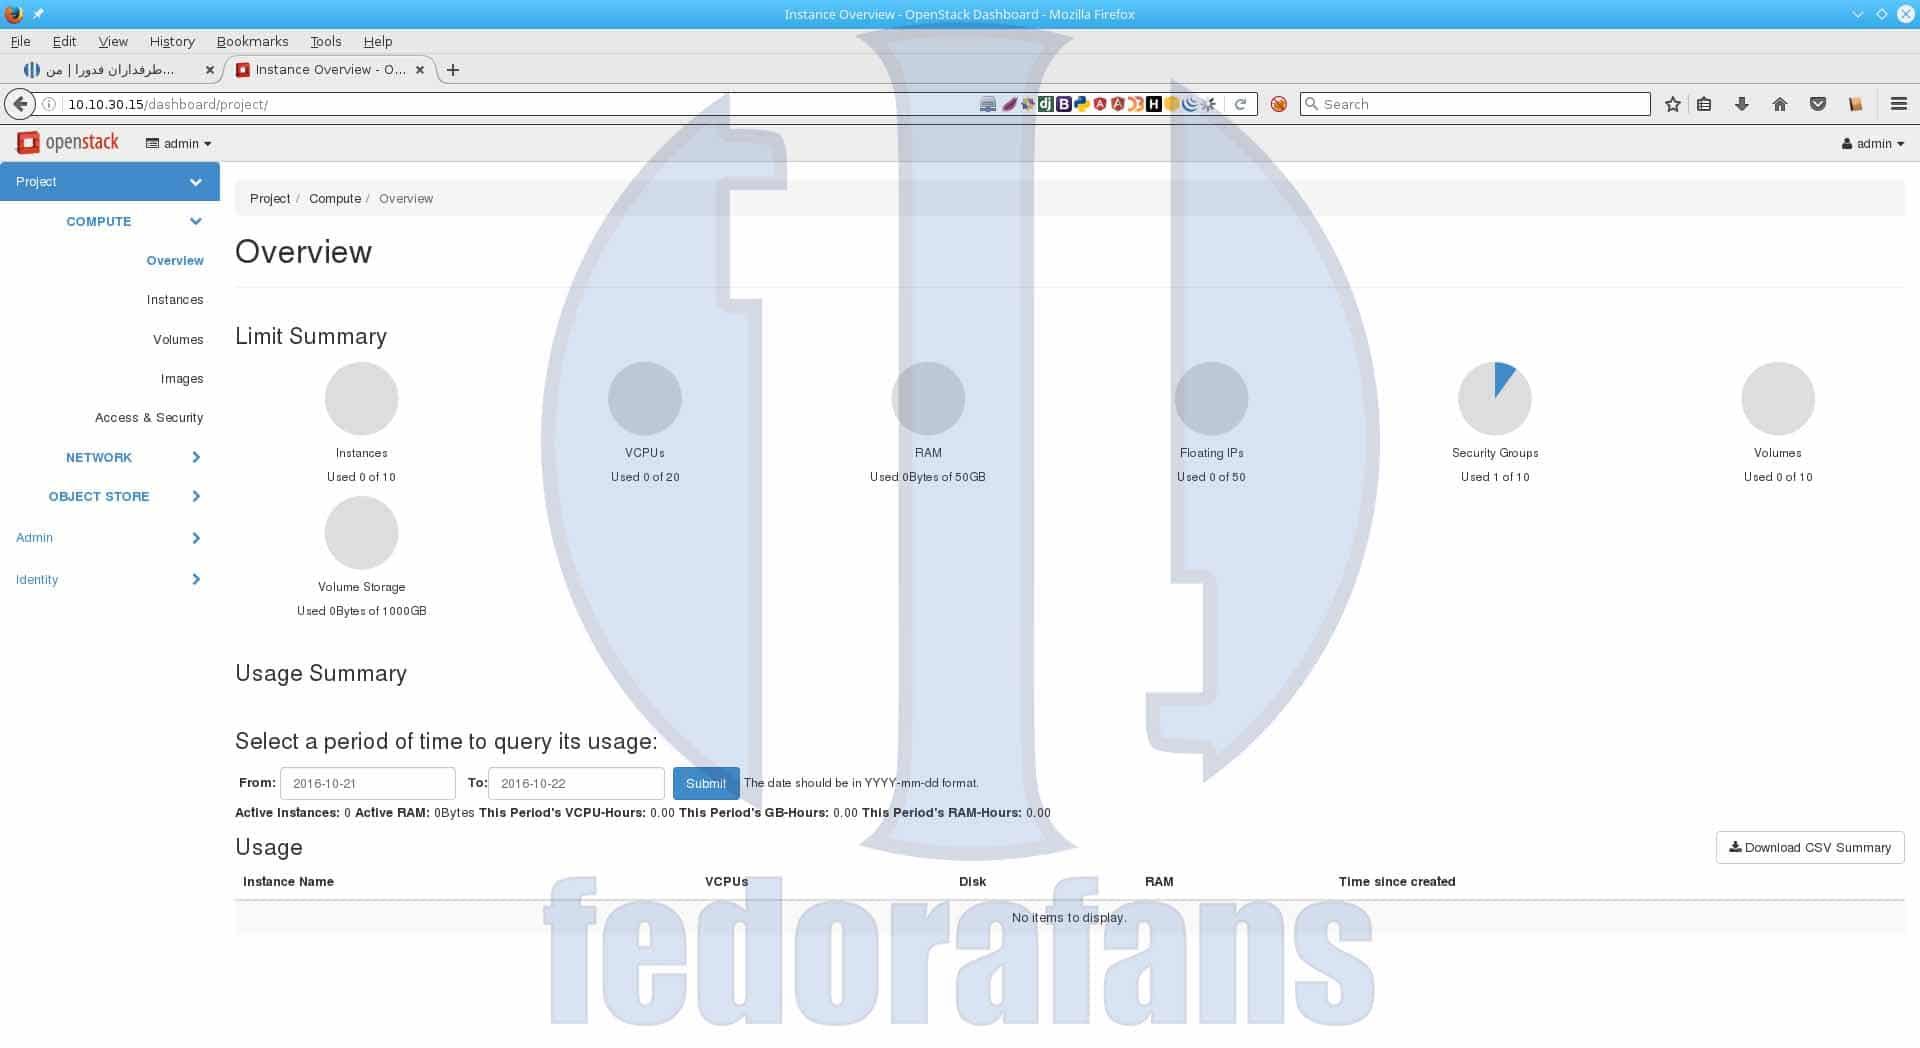 3-openstack-newton-fedorafans-com